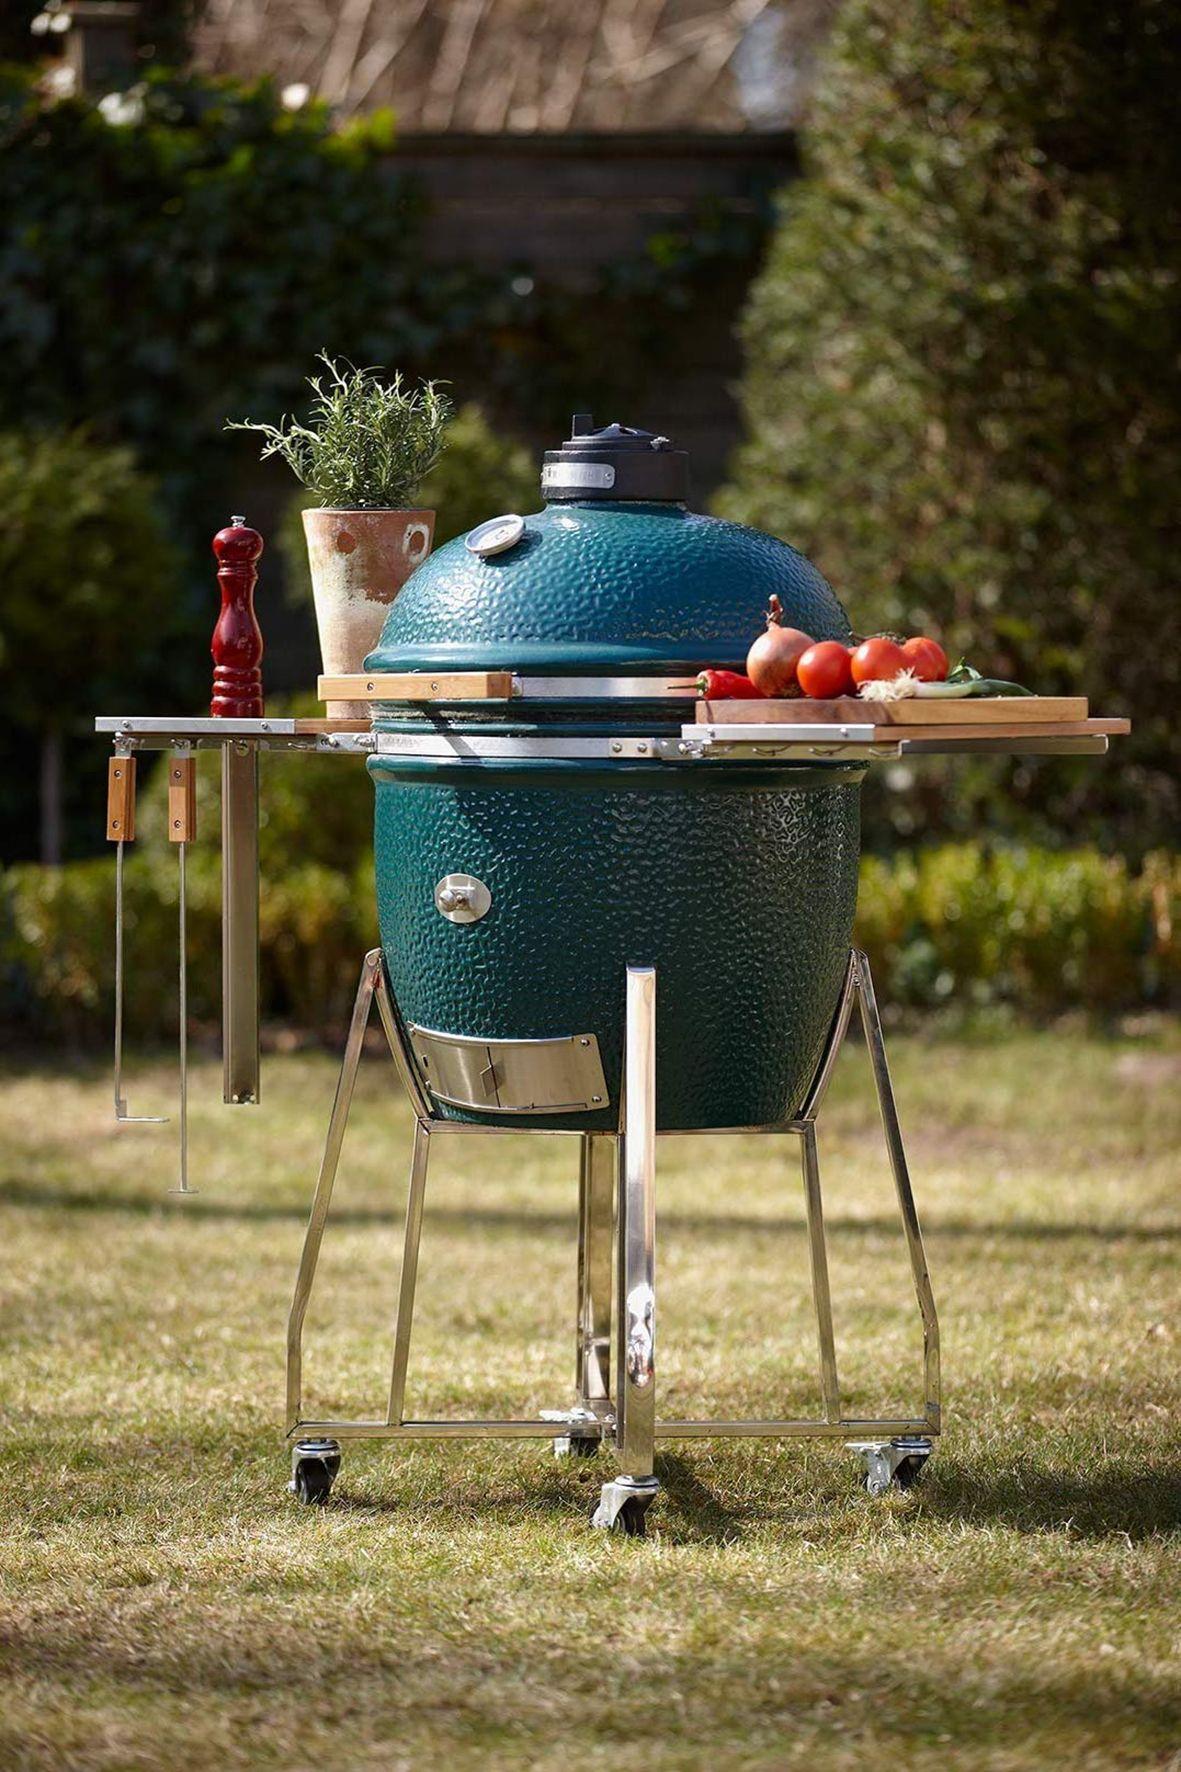 Modele Barbecue barbecueandco #barbecue #grill - modèle monolith - barbecue&co